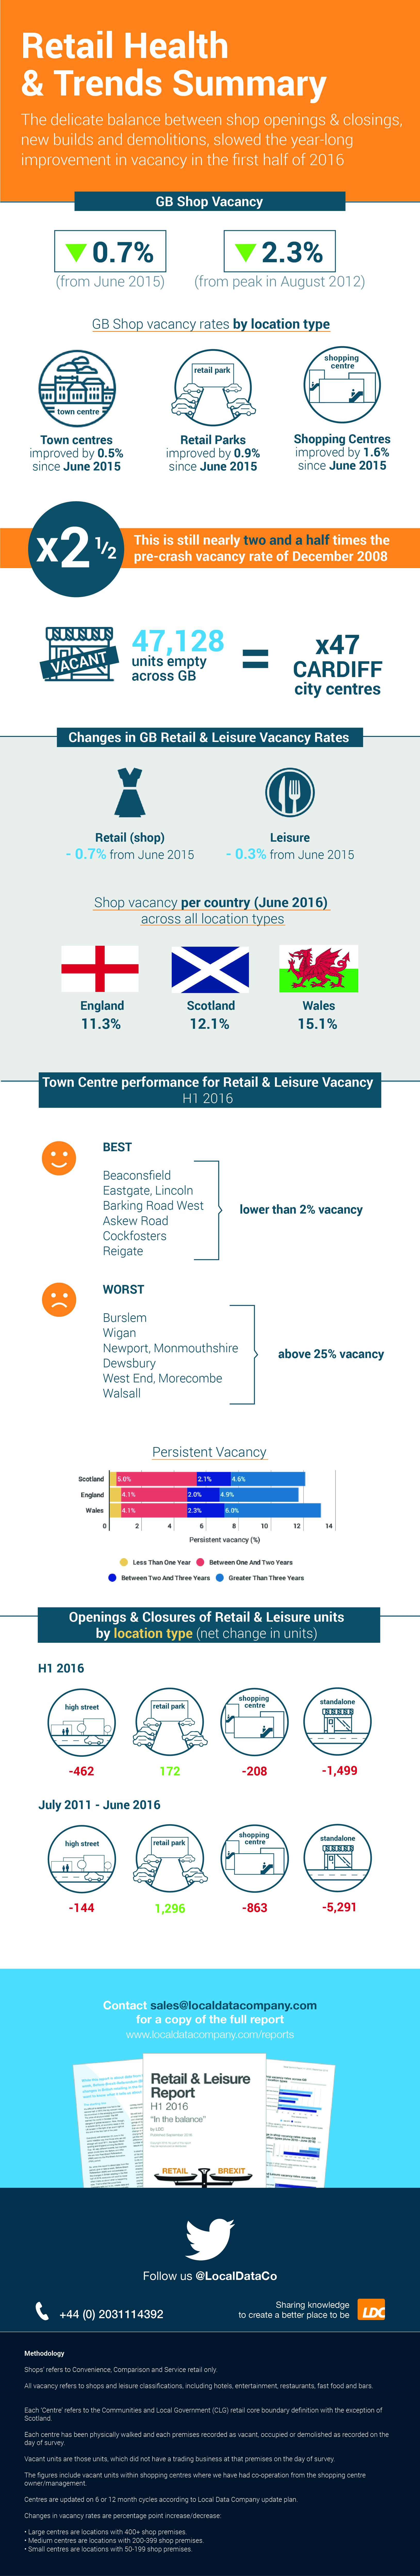 Infographic_H1_2016_Retail__Leisure_Report.jpg